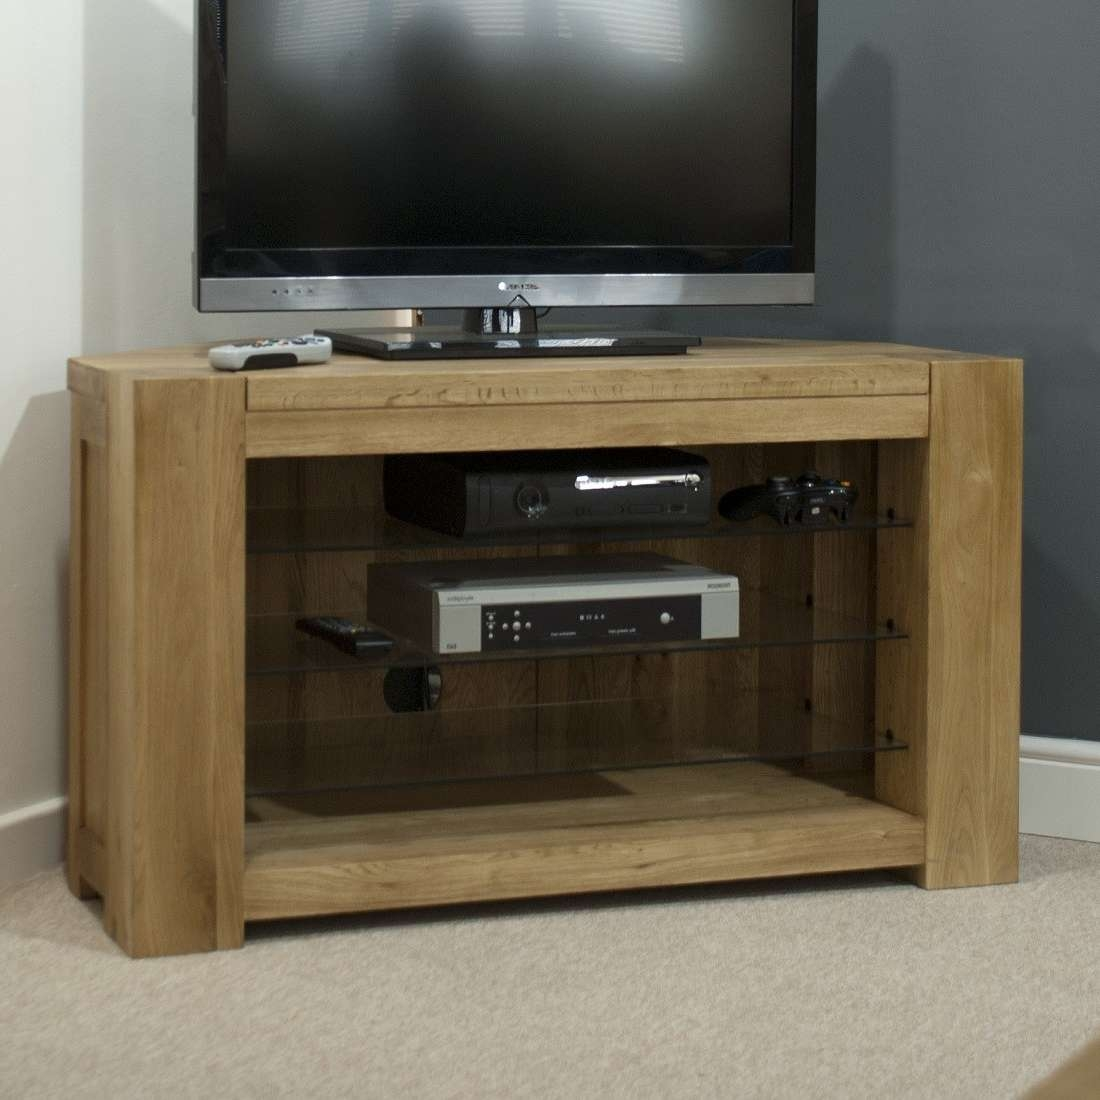 Trend Solid Oak Corner Tv Unit | Oak Furniture Uk In Contemporary Oak Tv Cabinets (View 2 of 20)